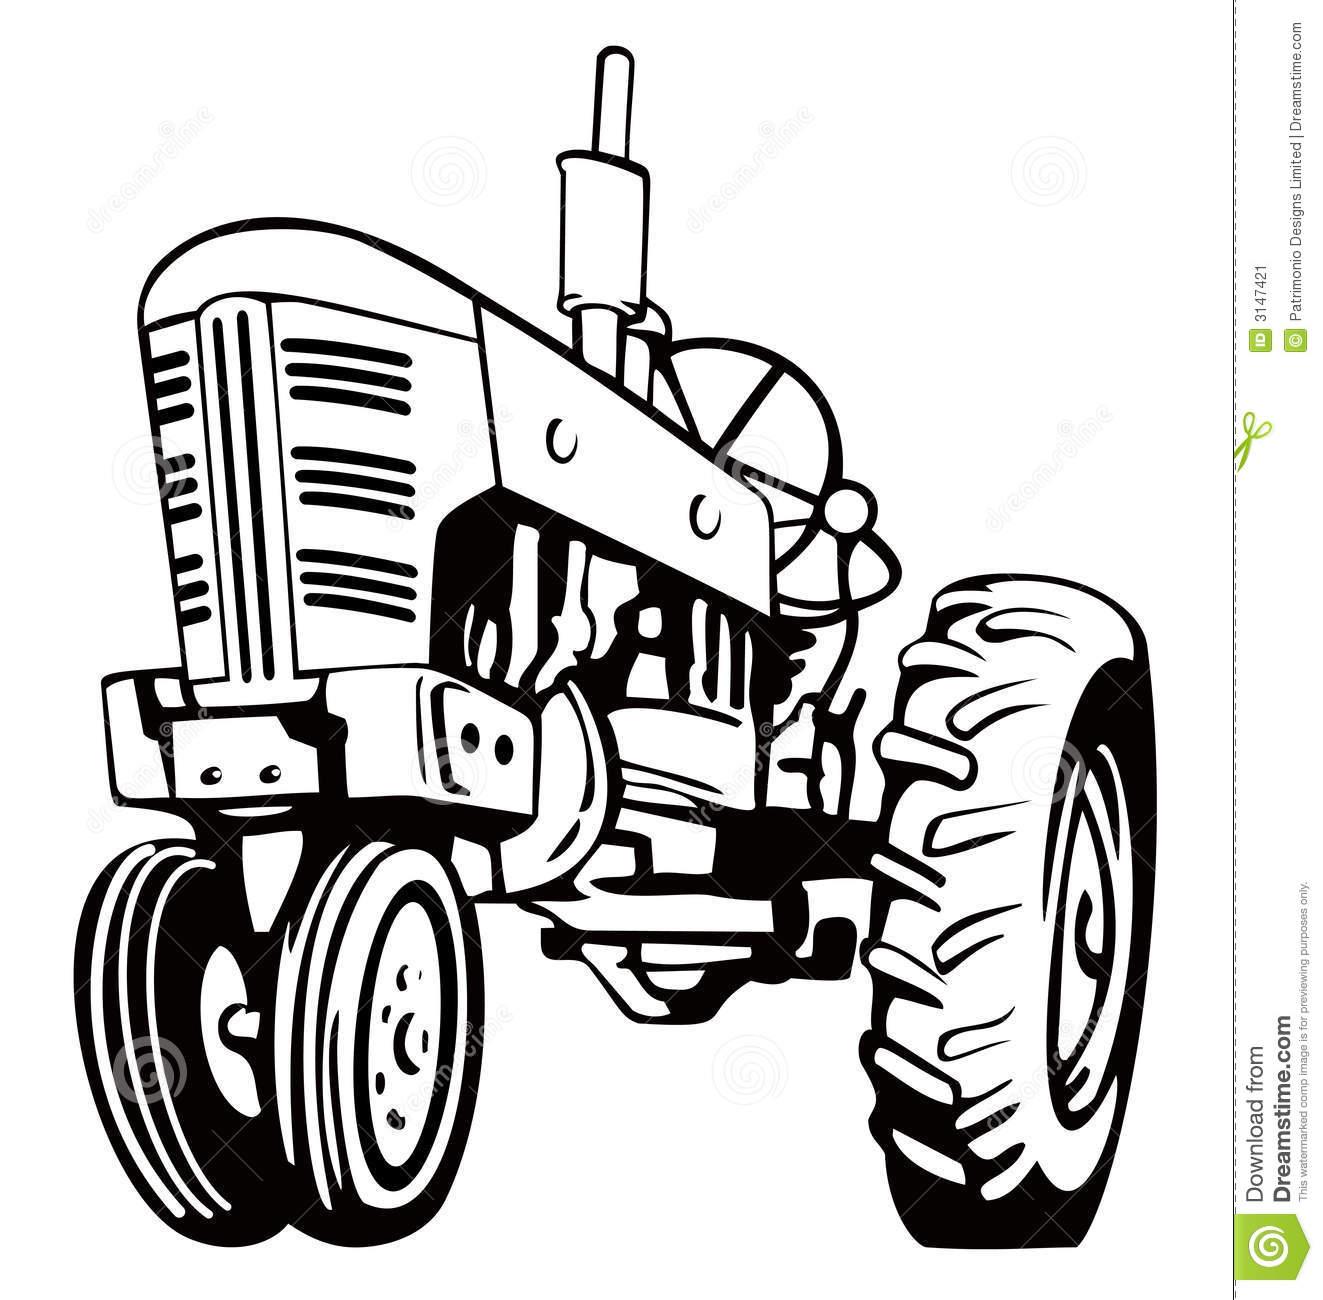 john deere tractor silhouette at getdrawings com free for personal rh getdrawings com vintage tractor clipart free tractor trailer clipart free download